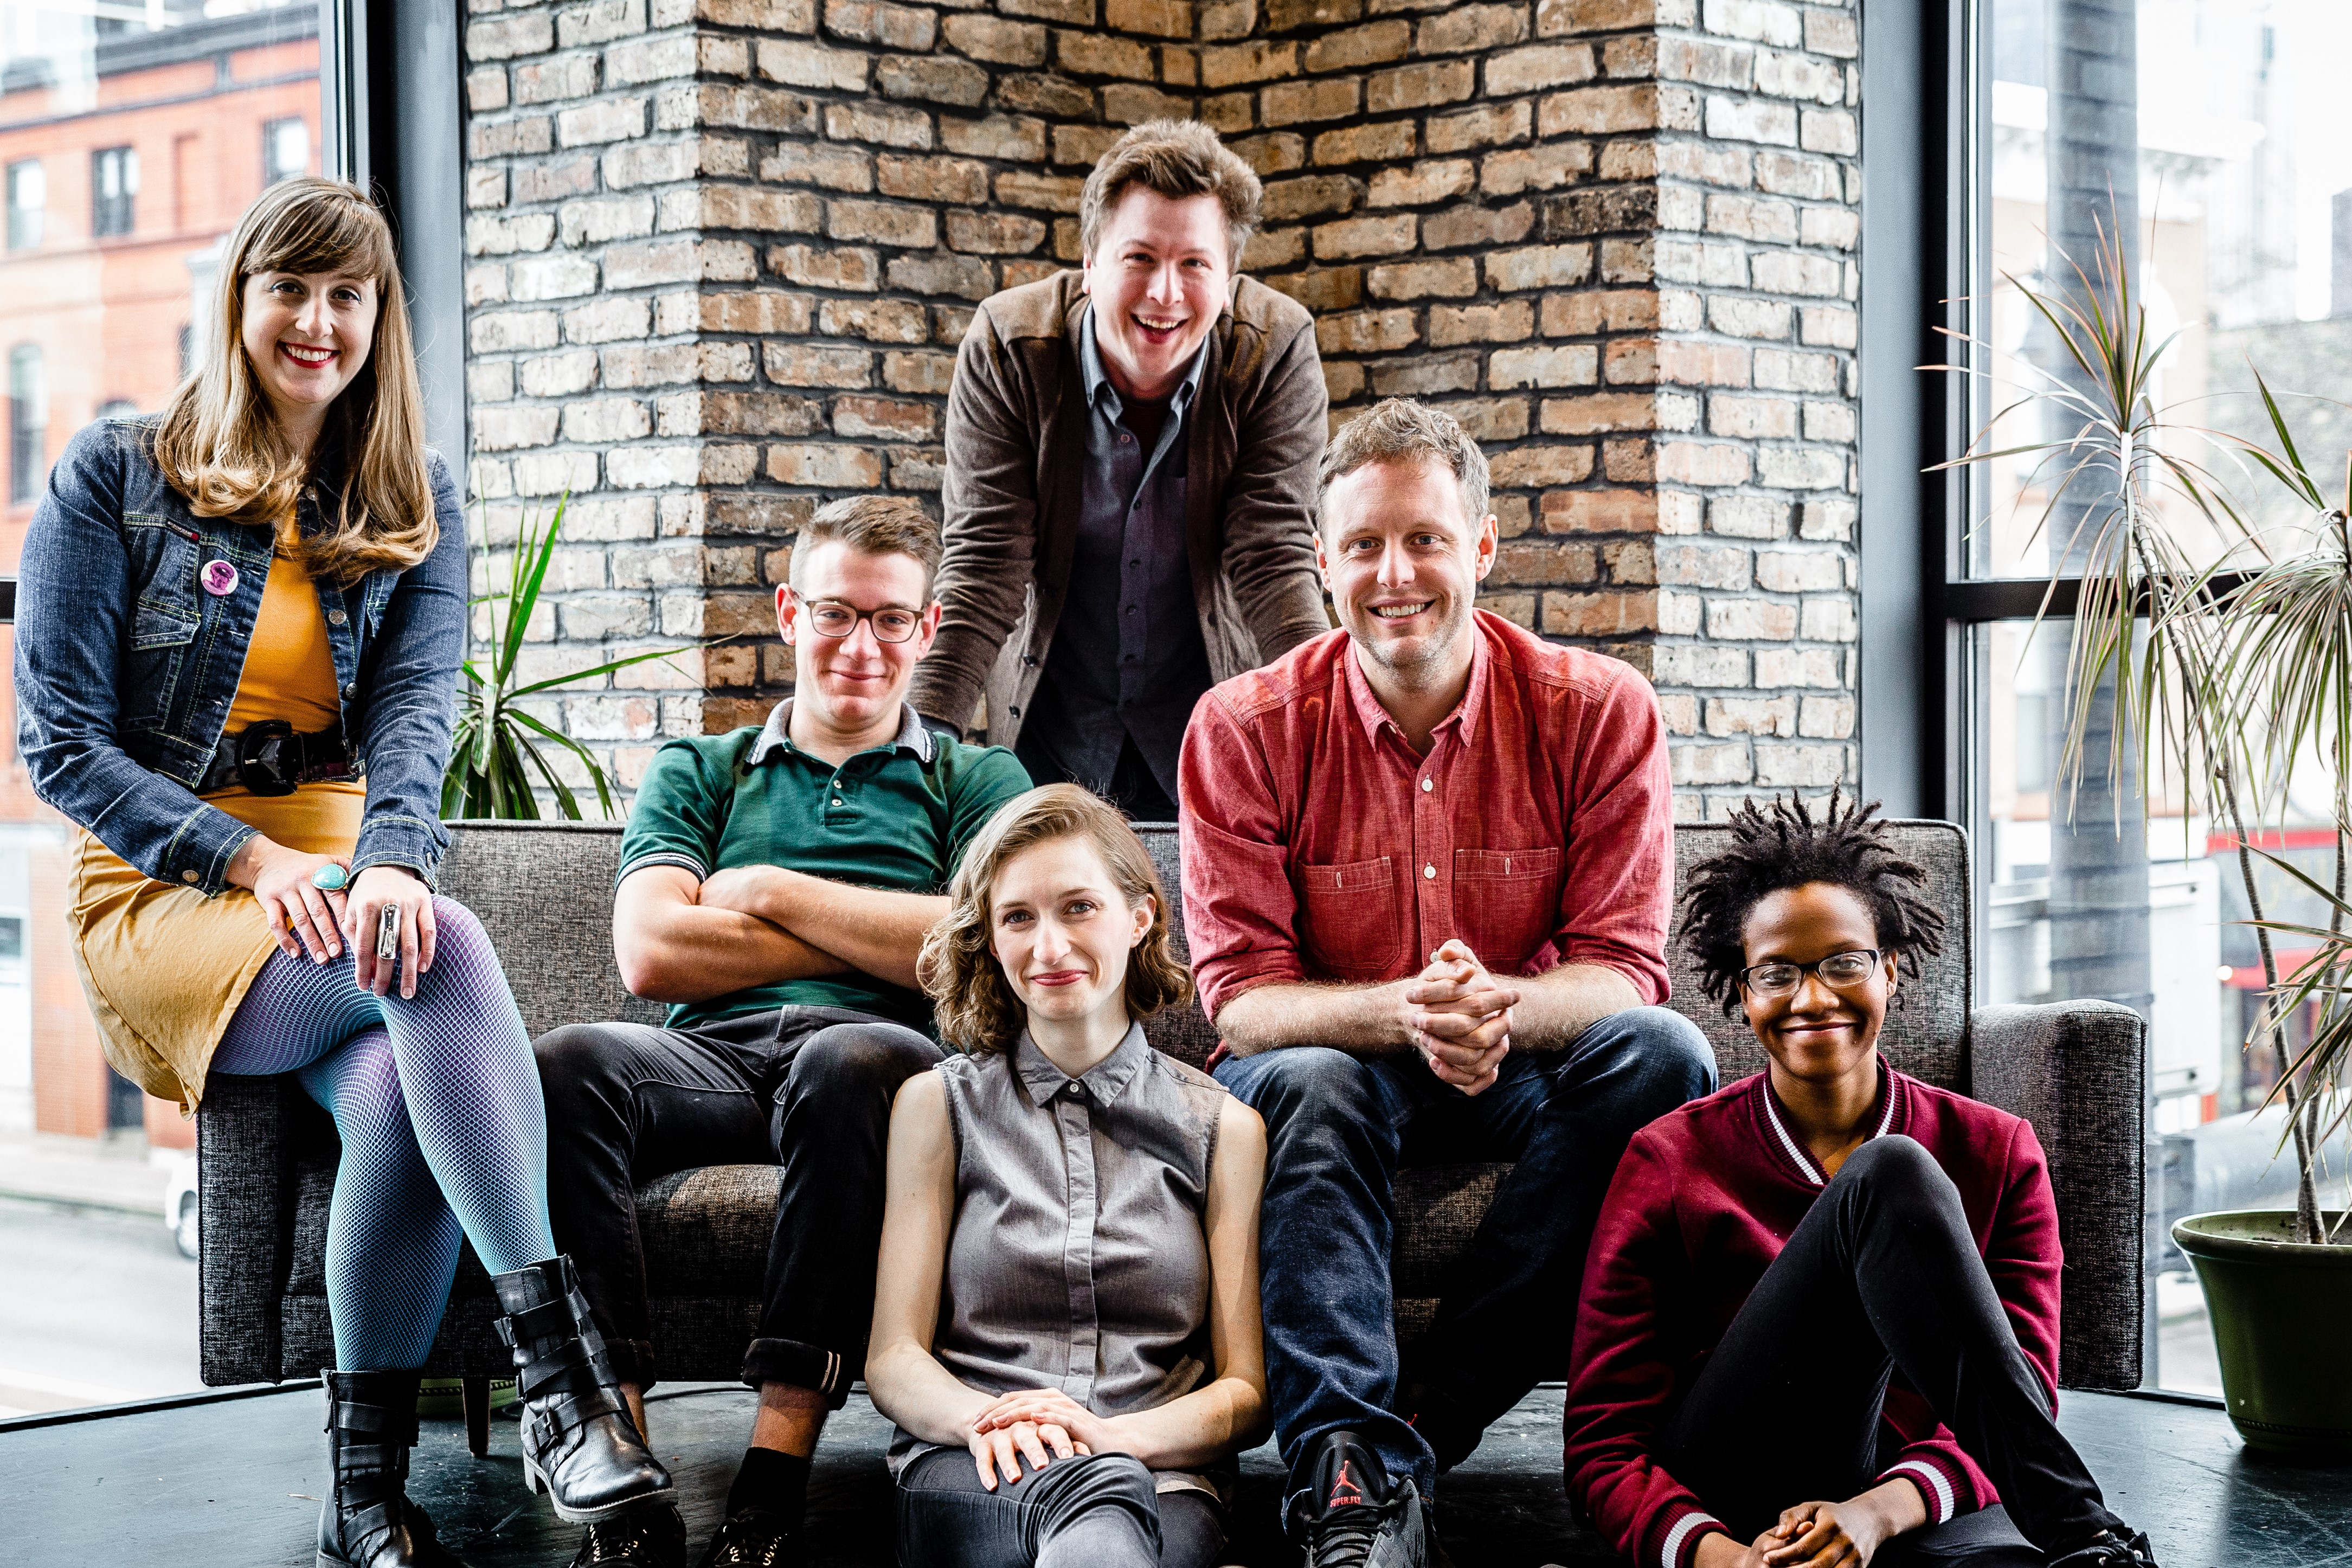 The cast of The Second City's Summer Blockbuster (l. to r.) Eve Krueger, Danny Catlow, Greg Ott, Adam Archer, Lauren Walker, and Alison Gates.